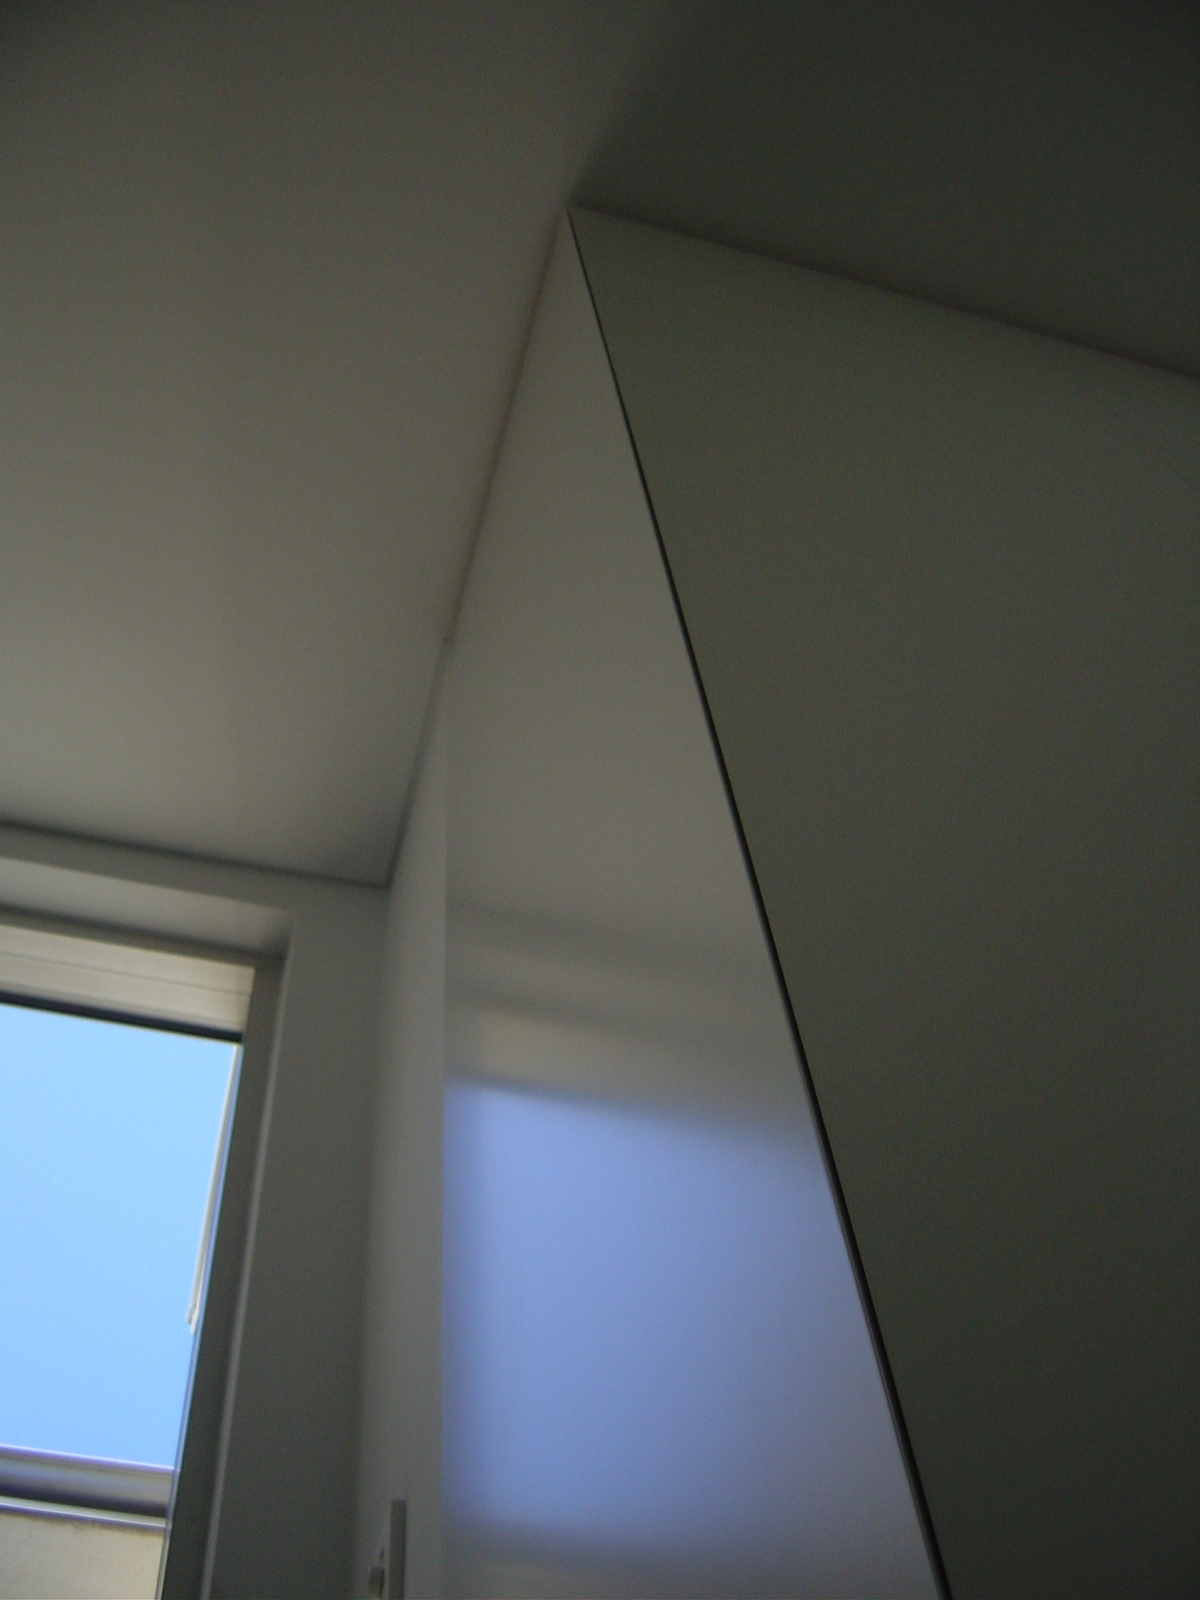 SydneyTerraceConstruction_06.JPG